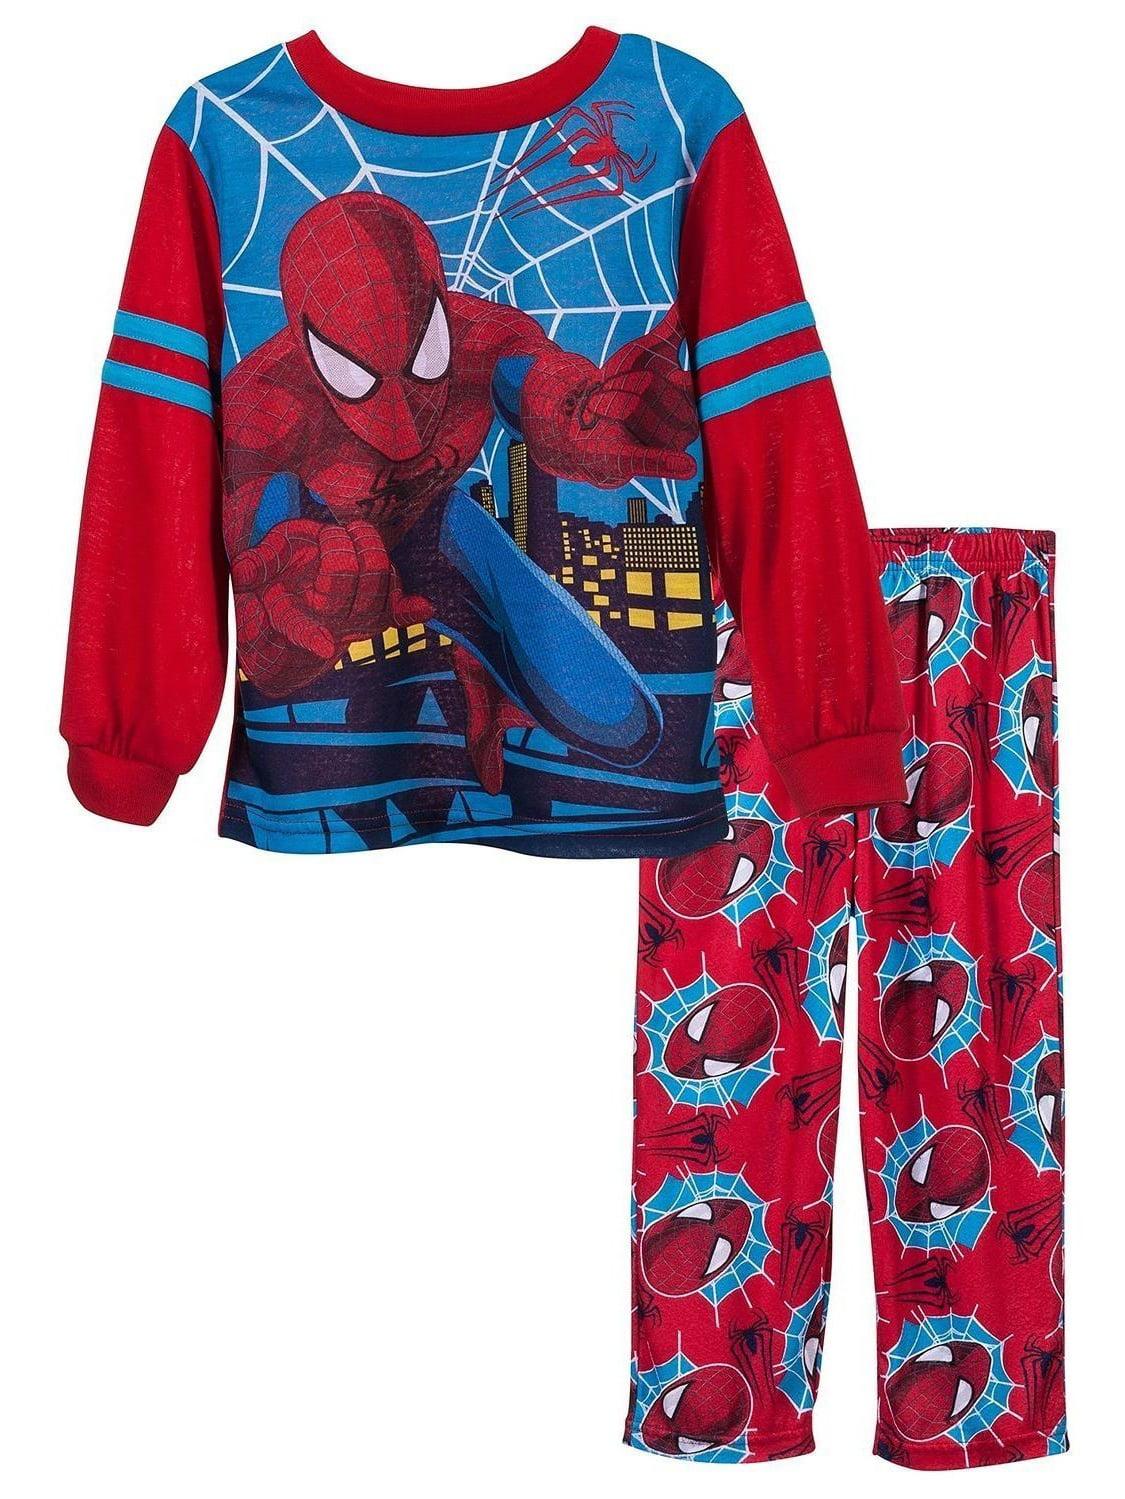 The Amazing Spiderman 2 Pajama Set